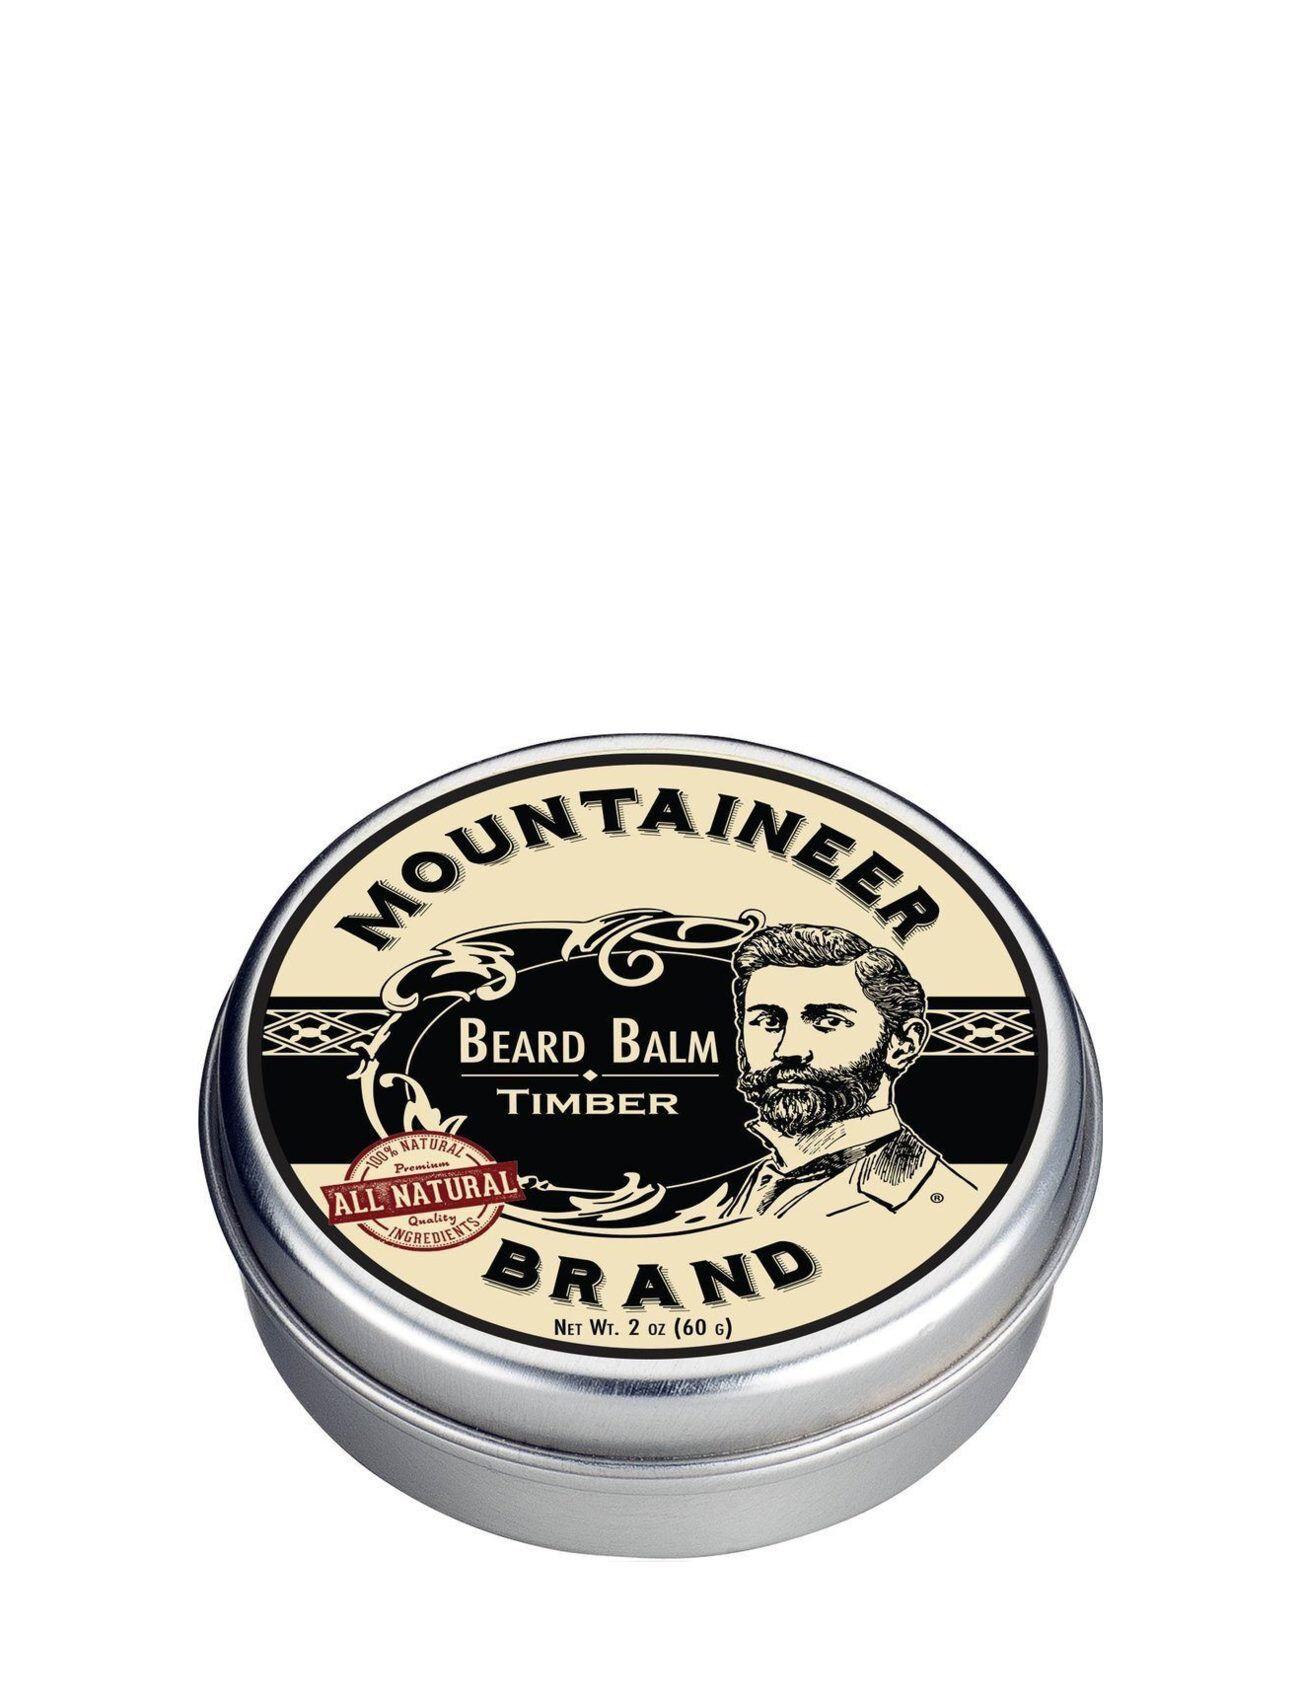 Mountaineer Brand Magic Timber Beard Balm